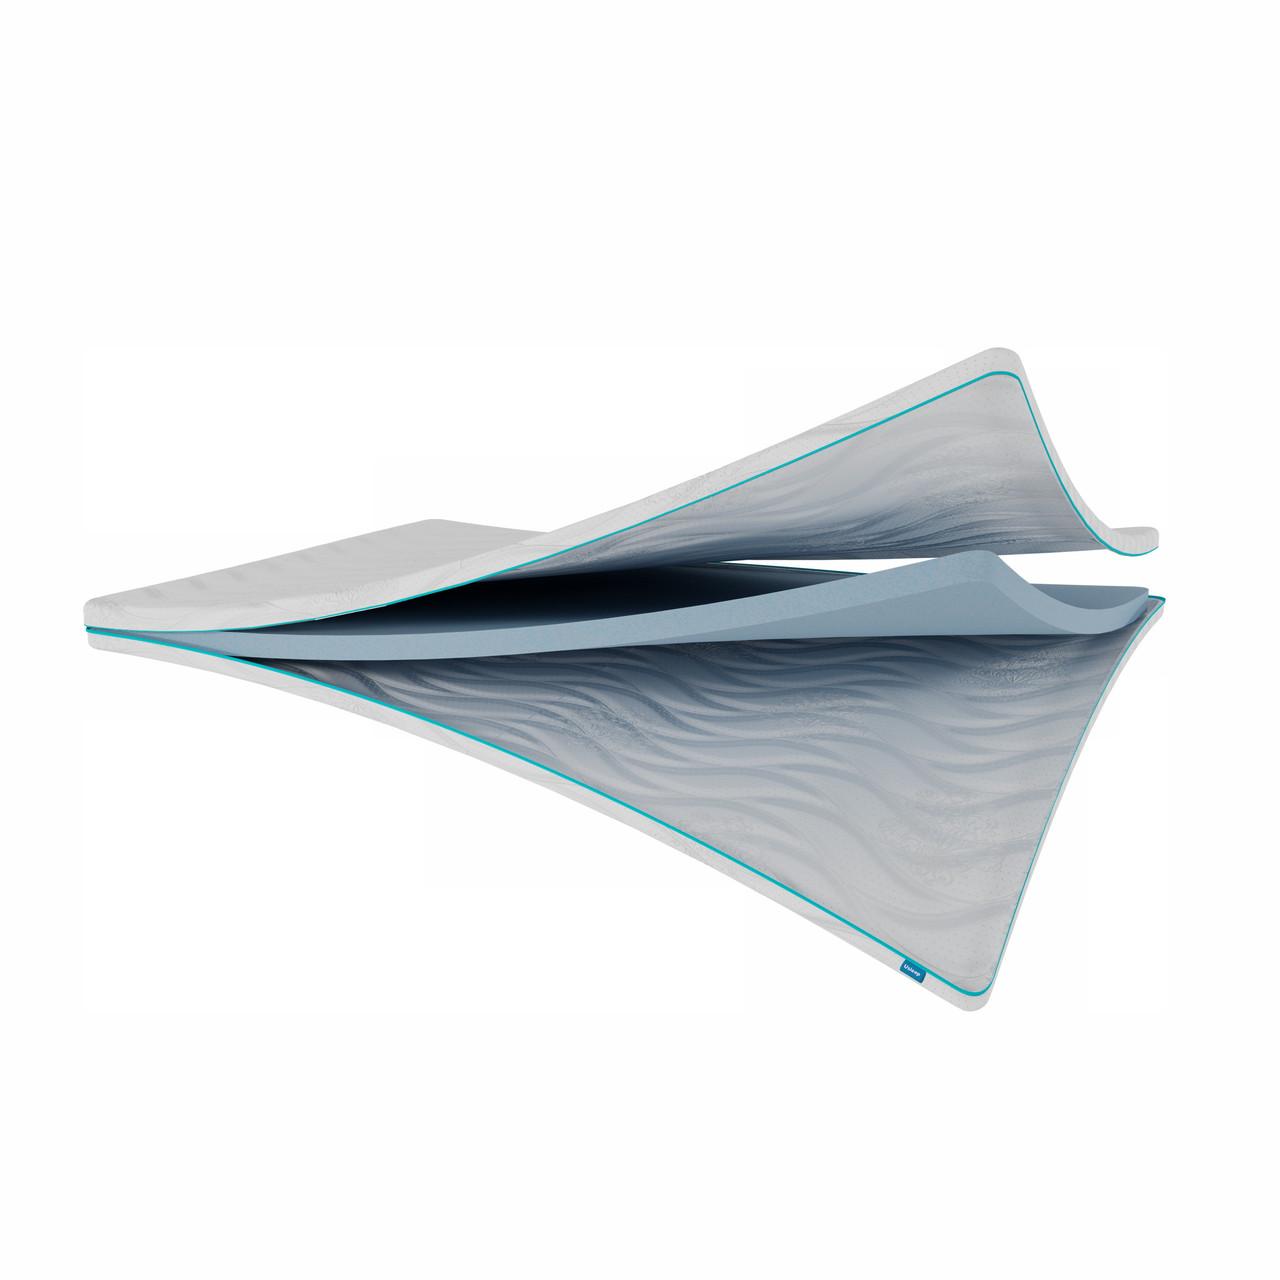 Тонкий матрац топпер-футон SleepRoll Mint Usleep 150х200